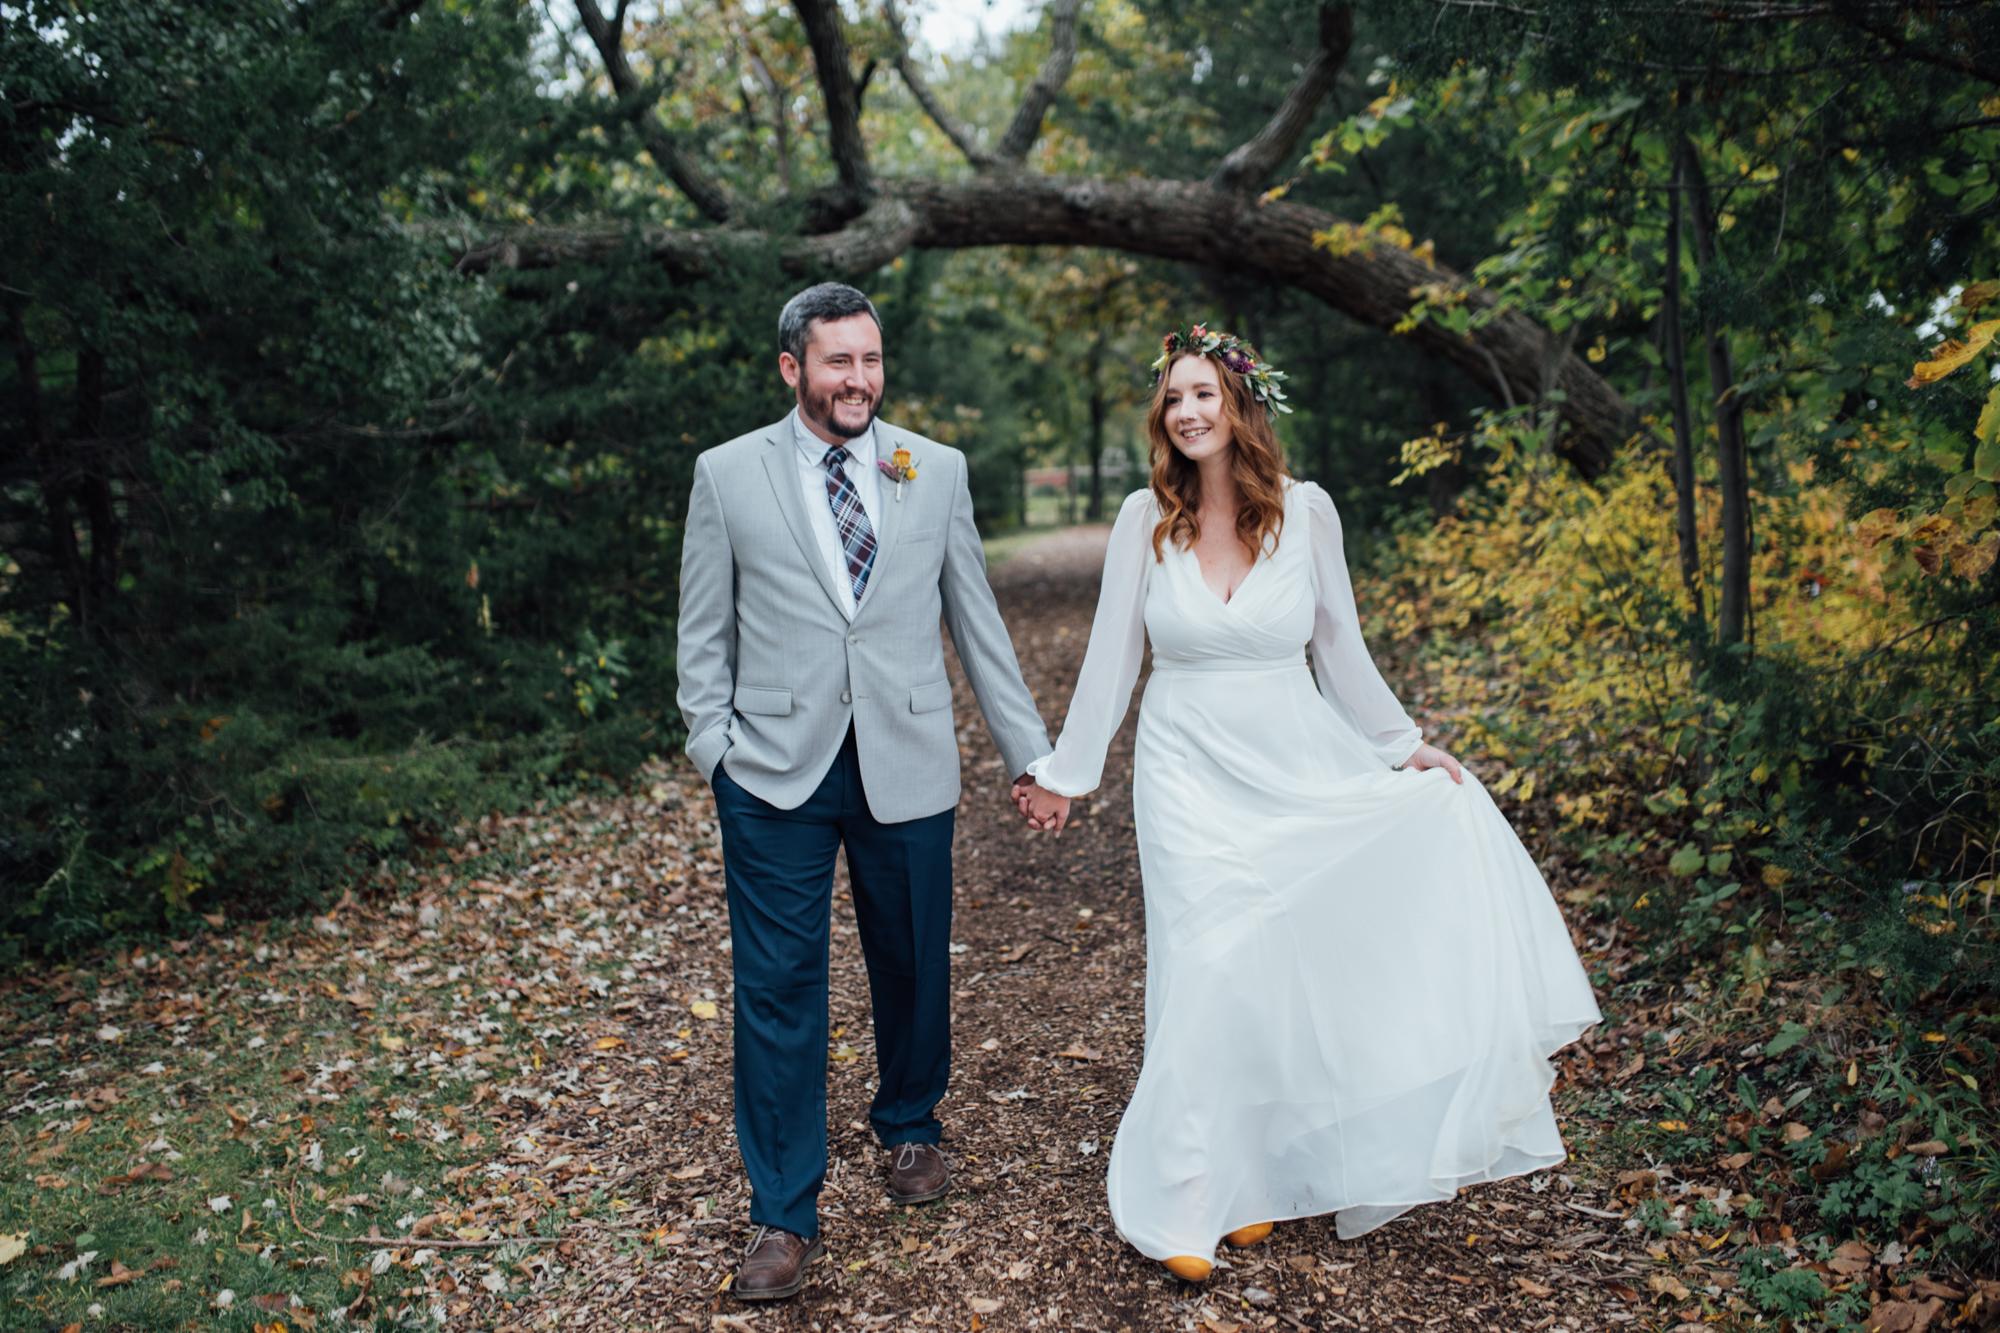 minneapolis-wedding-photographer-1-28.jpg